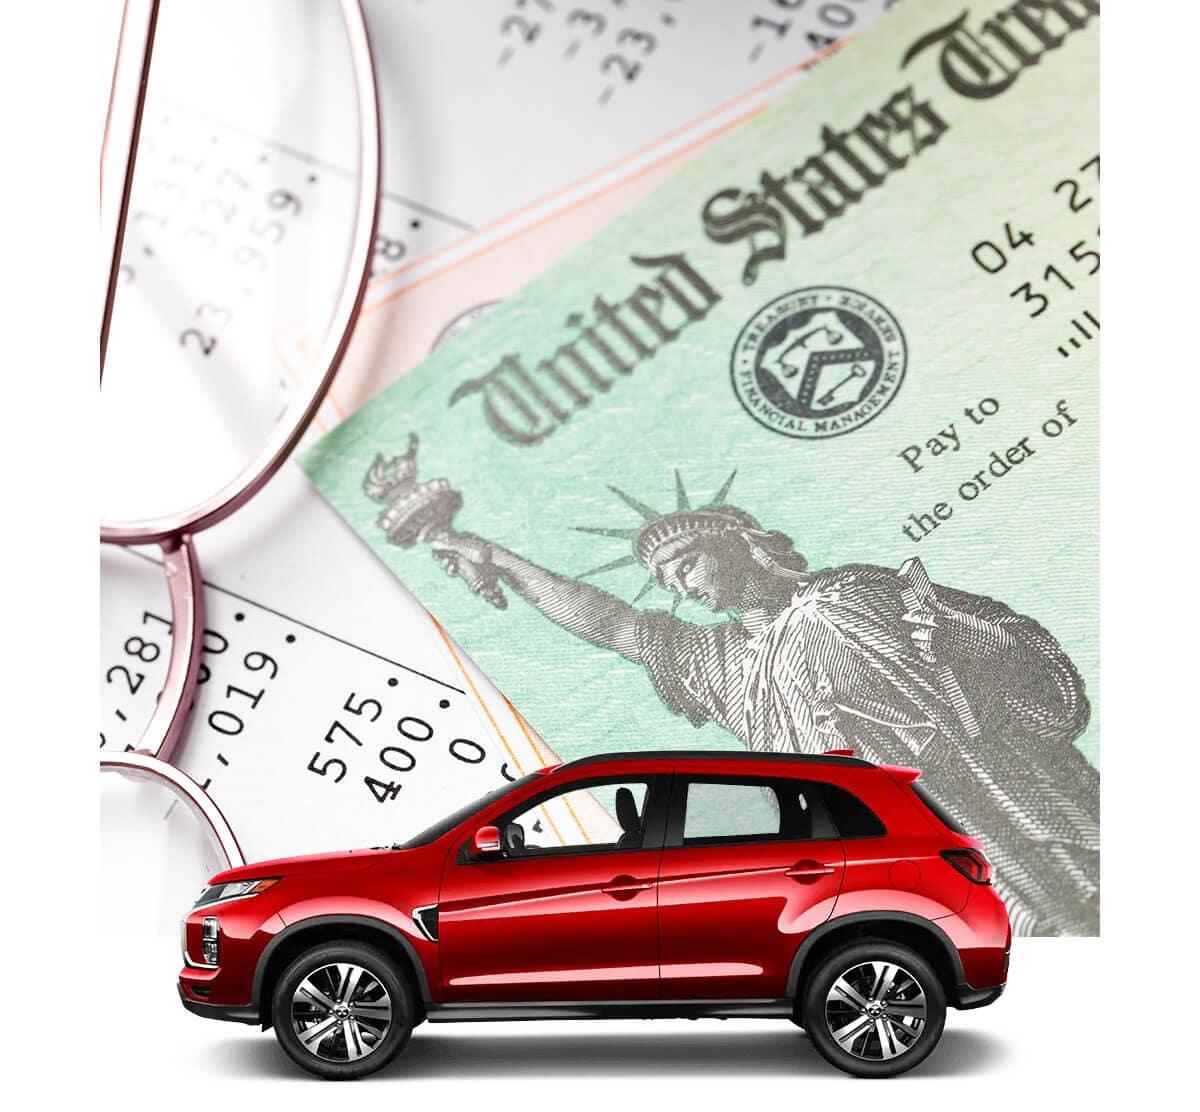 Mitsubishi Outlander Sport Tax Refund Image